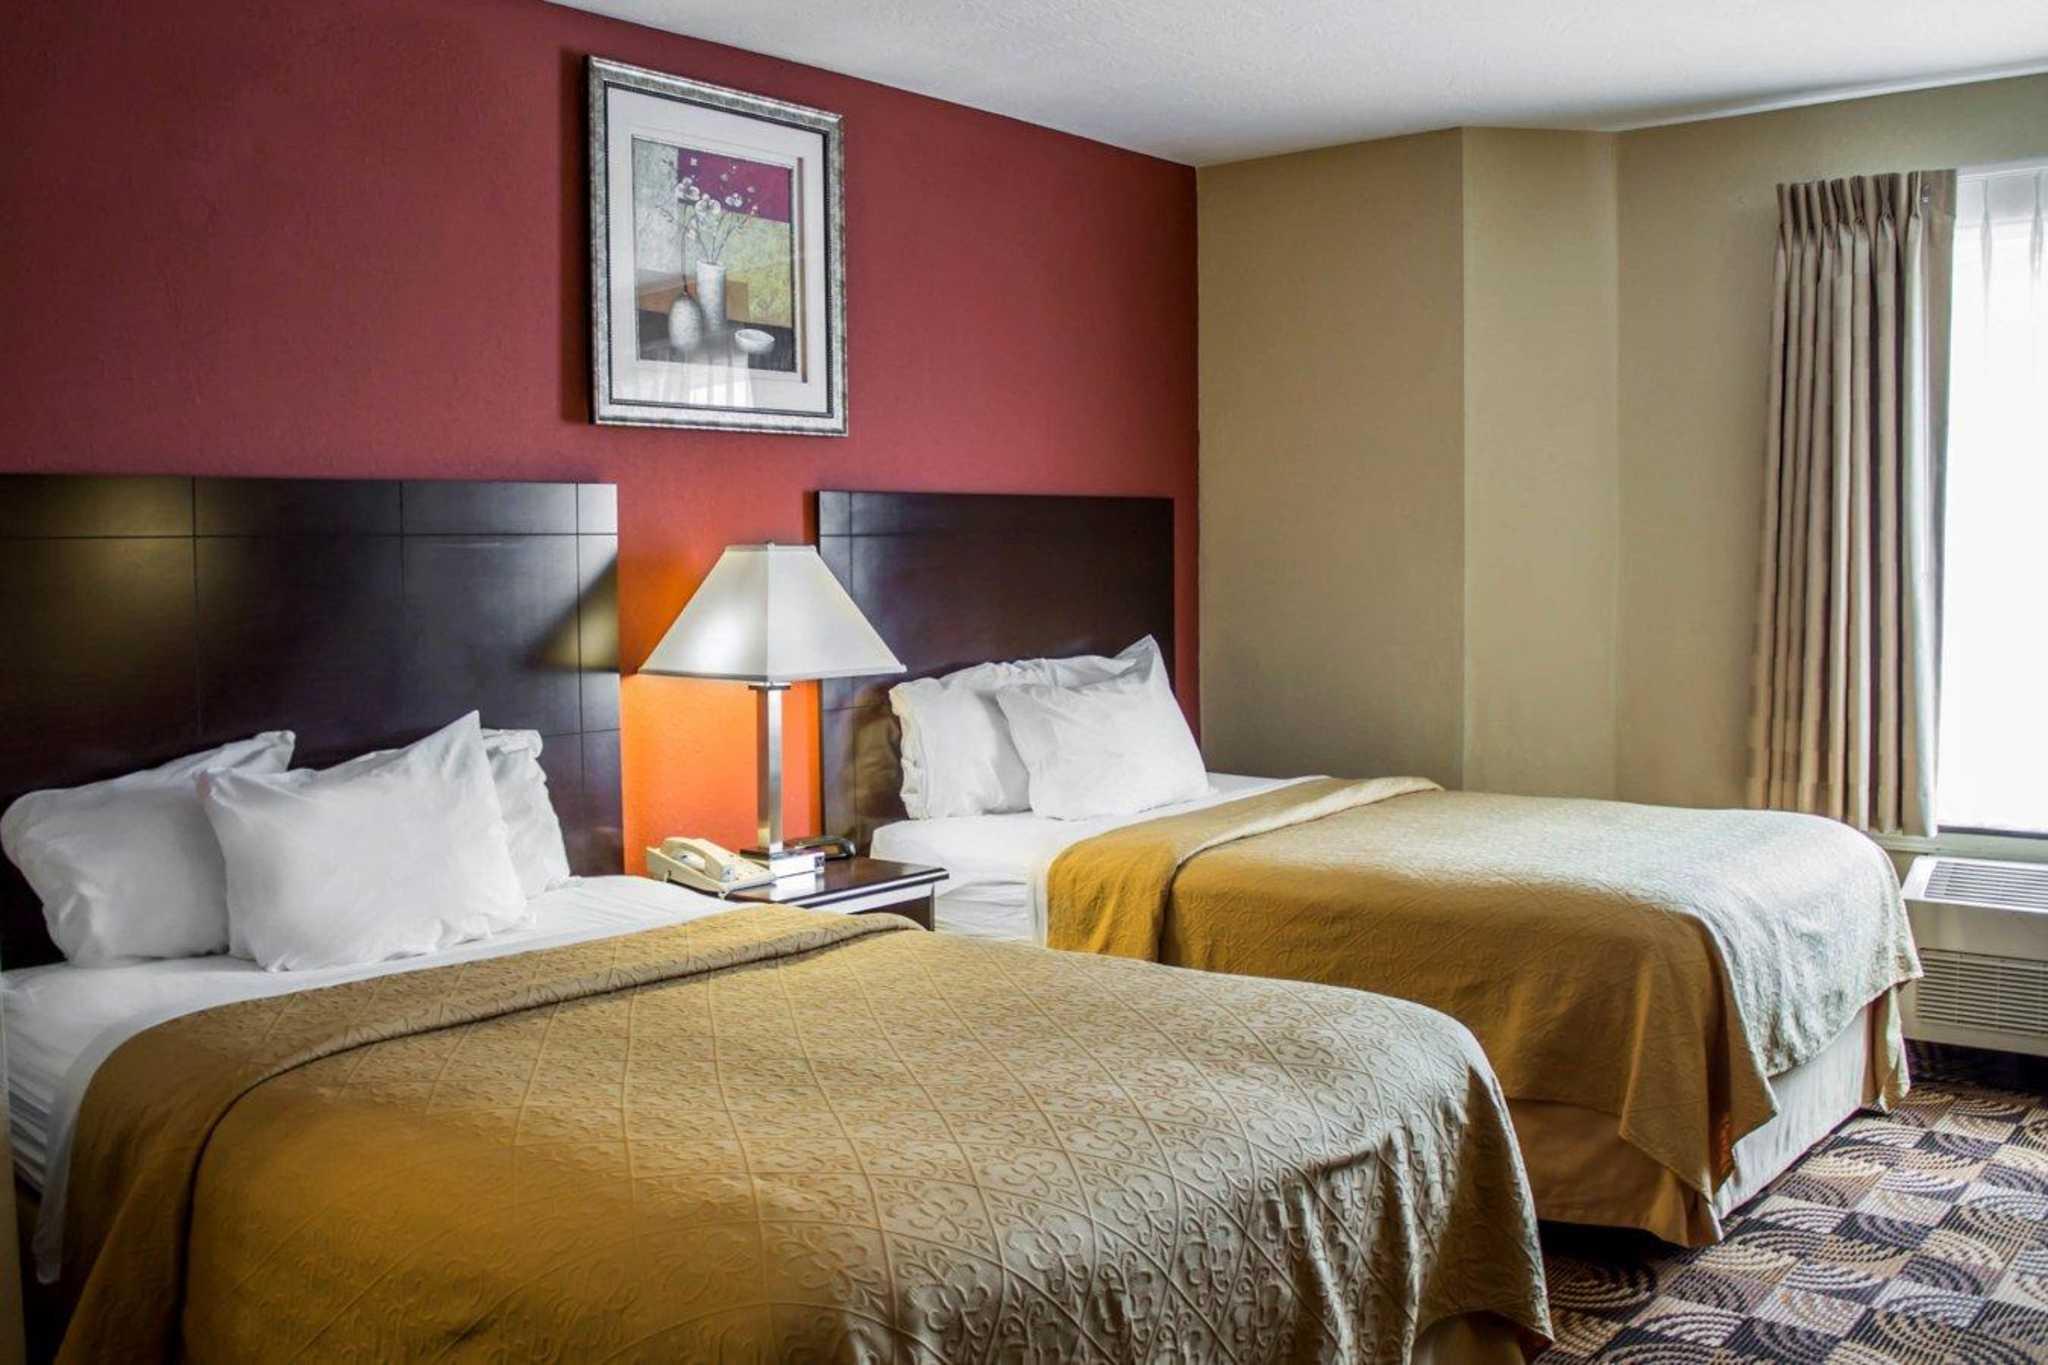 Quality Inn Brunswick Cleveland South image 10